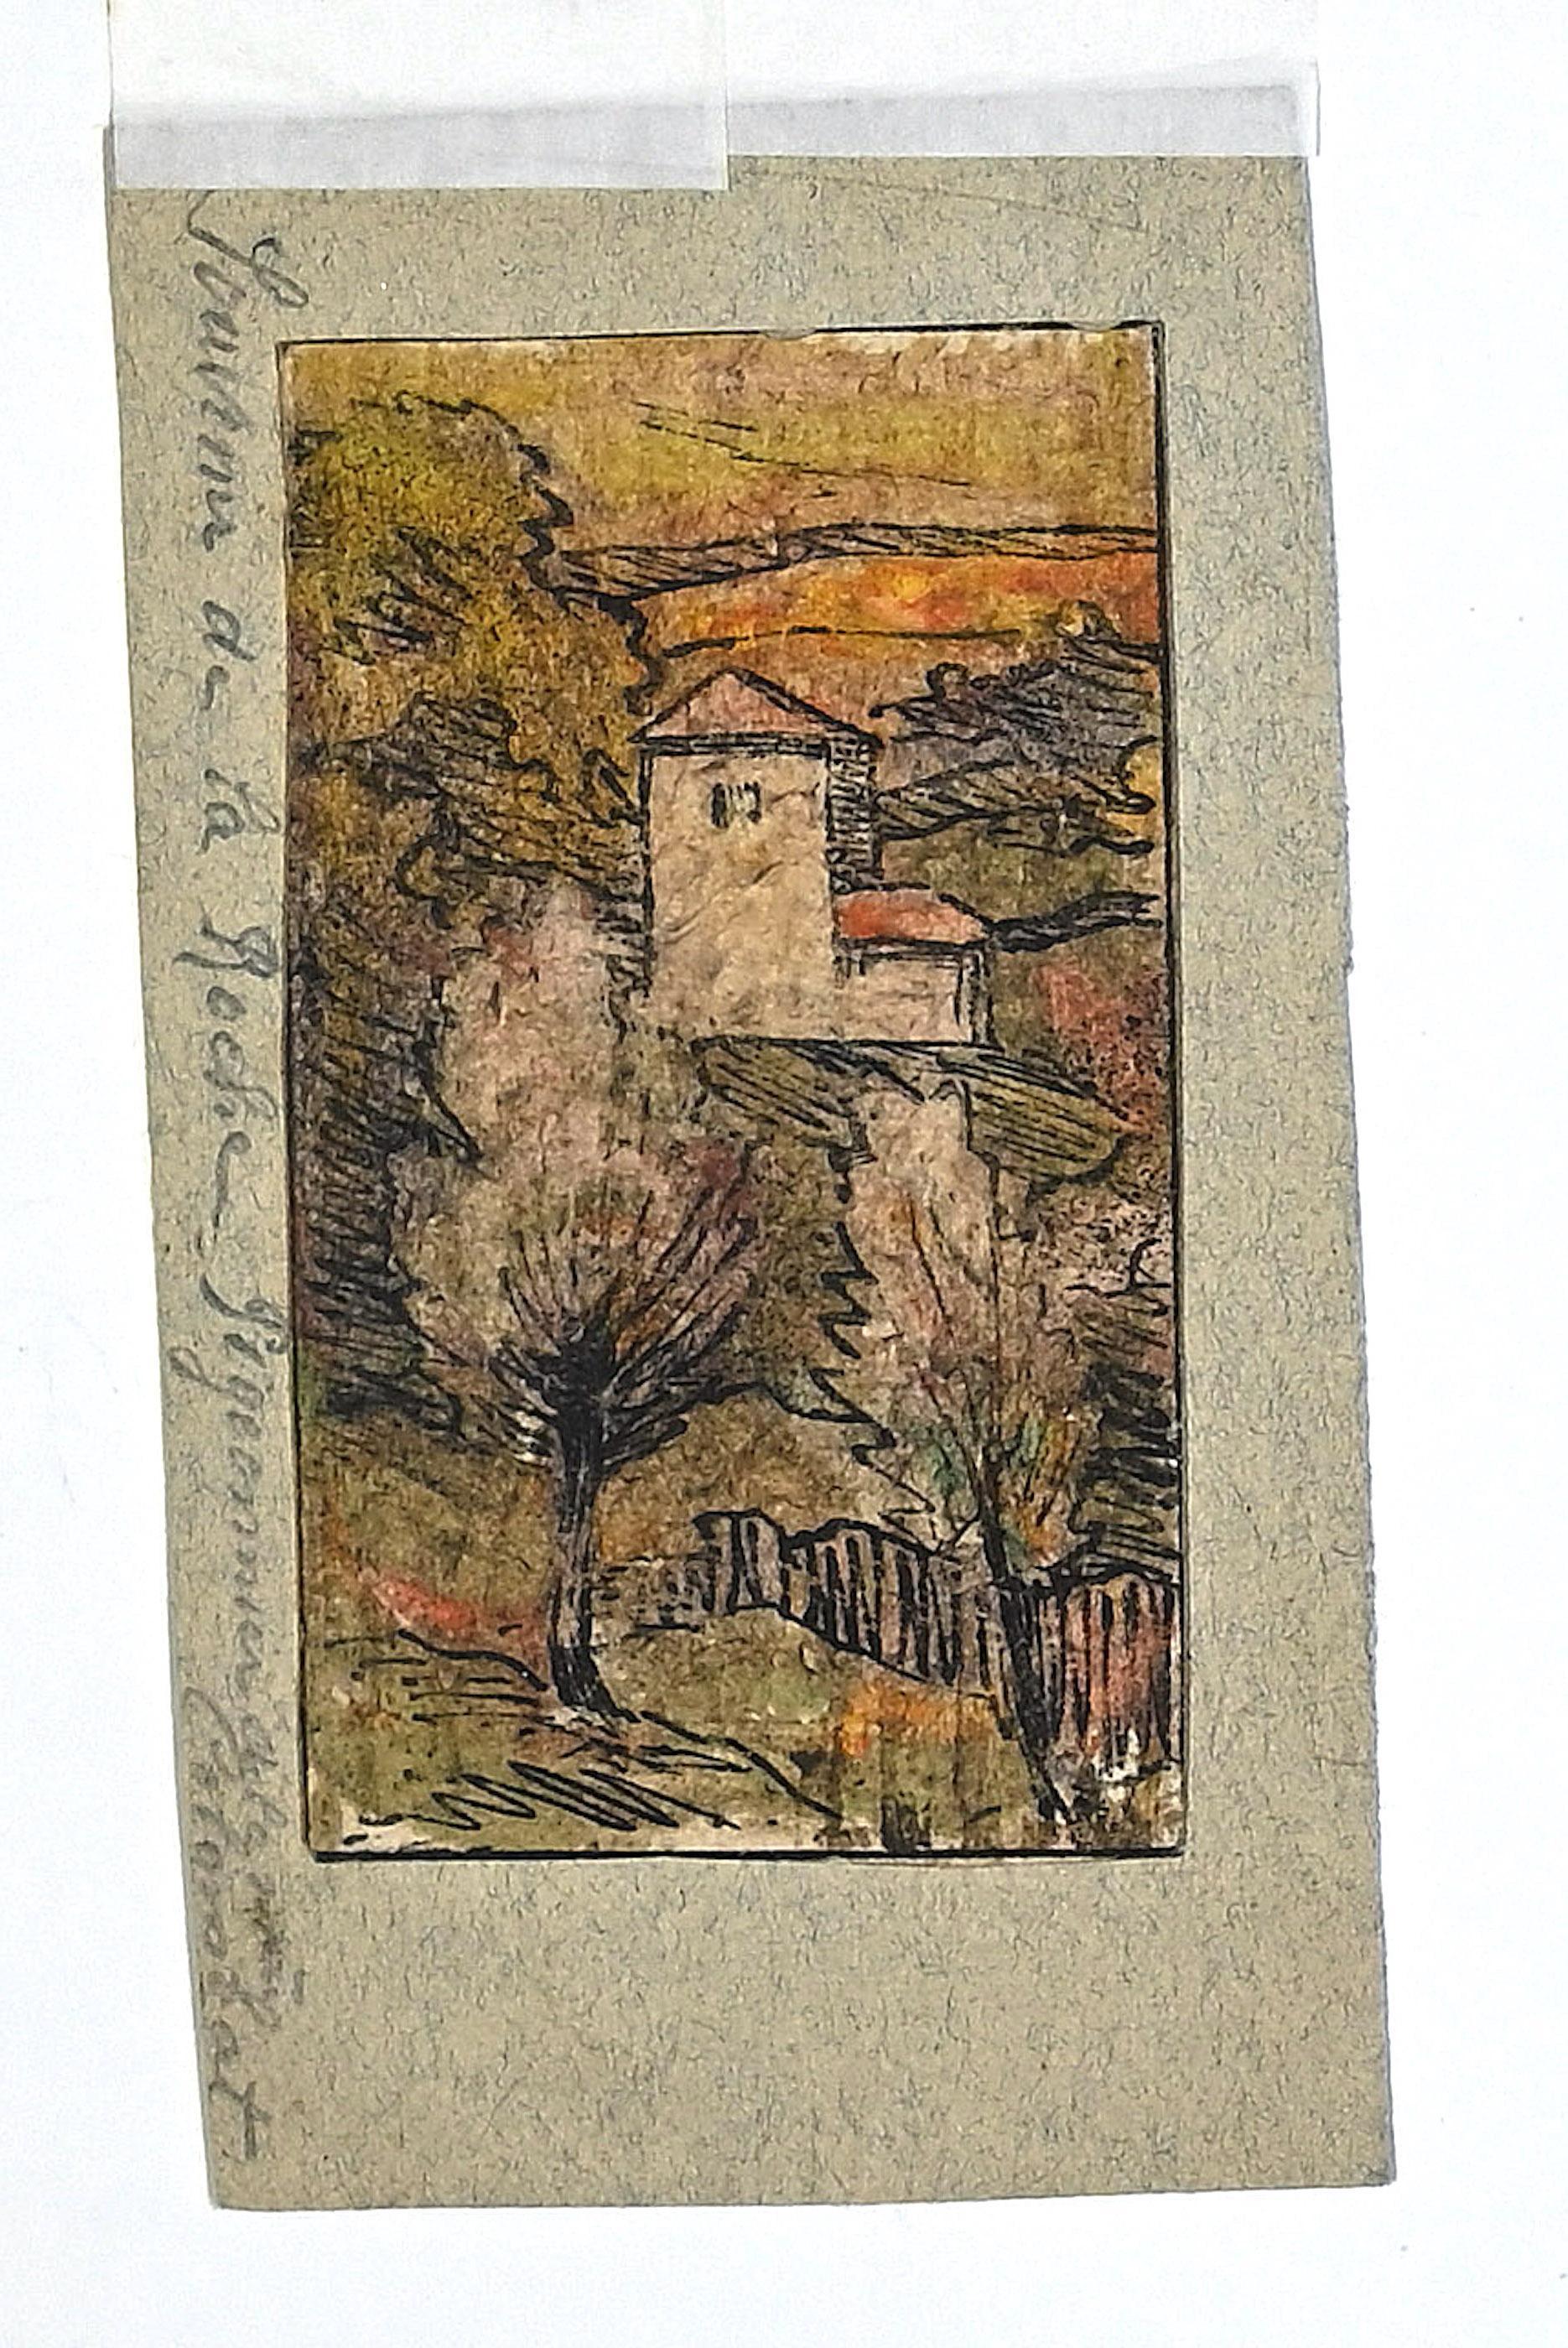 Souvenir de la Roche - Original China Ink and Watercolor - 19th Century